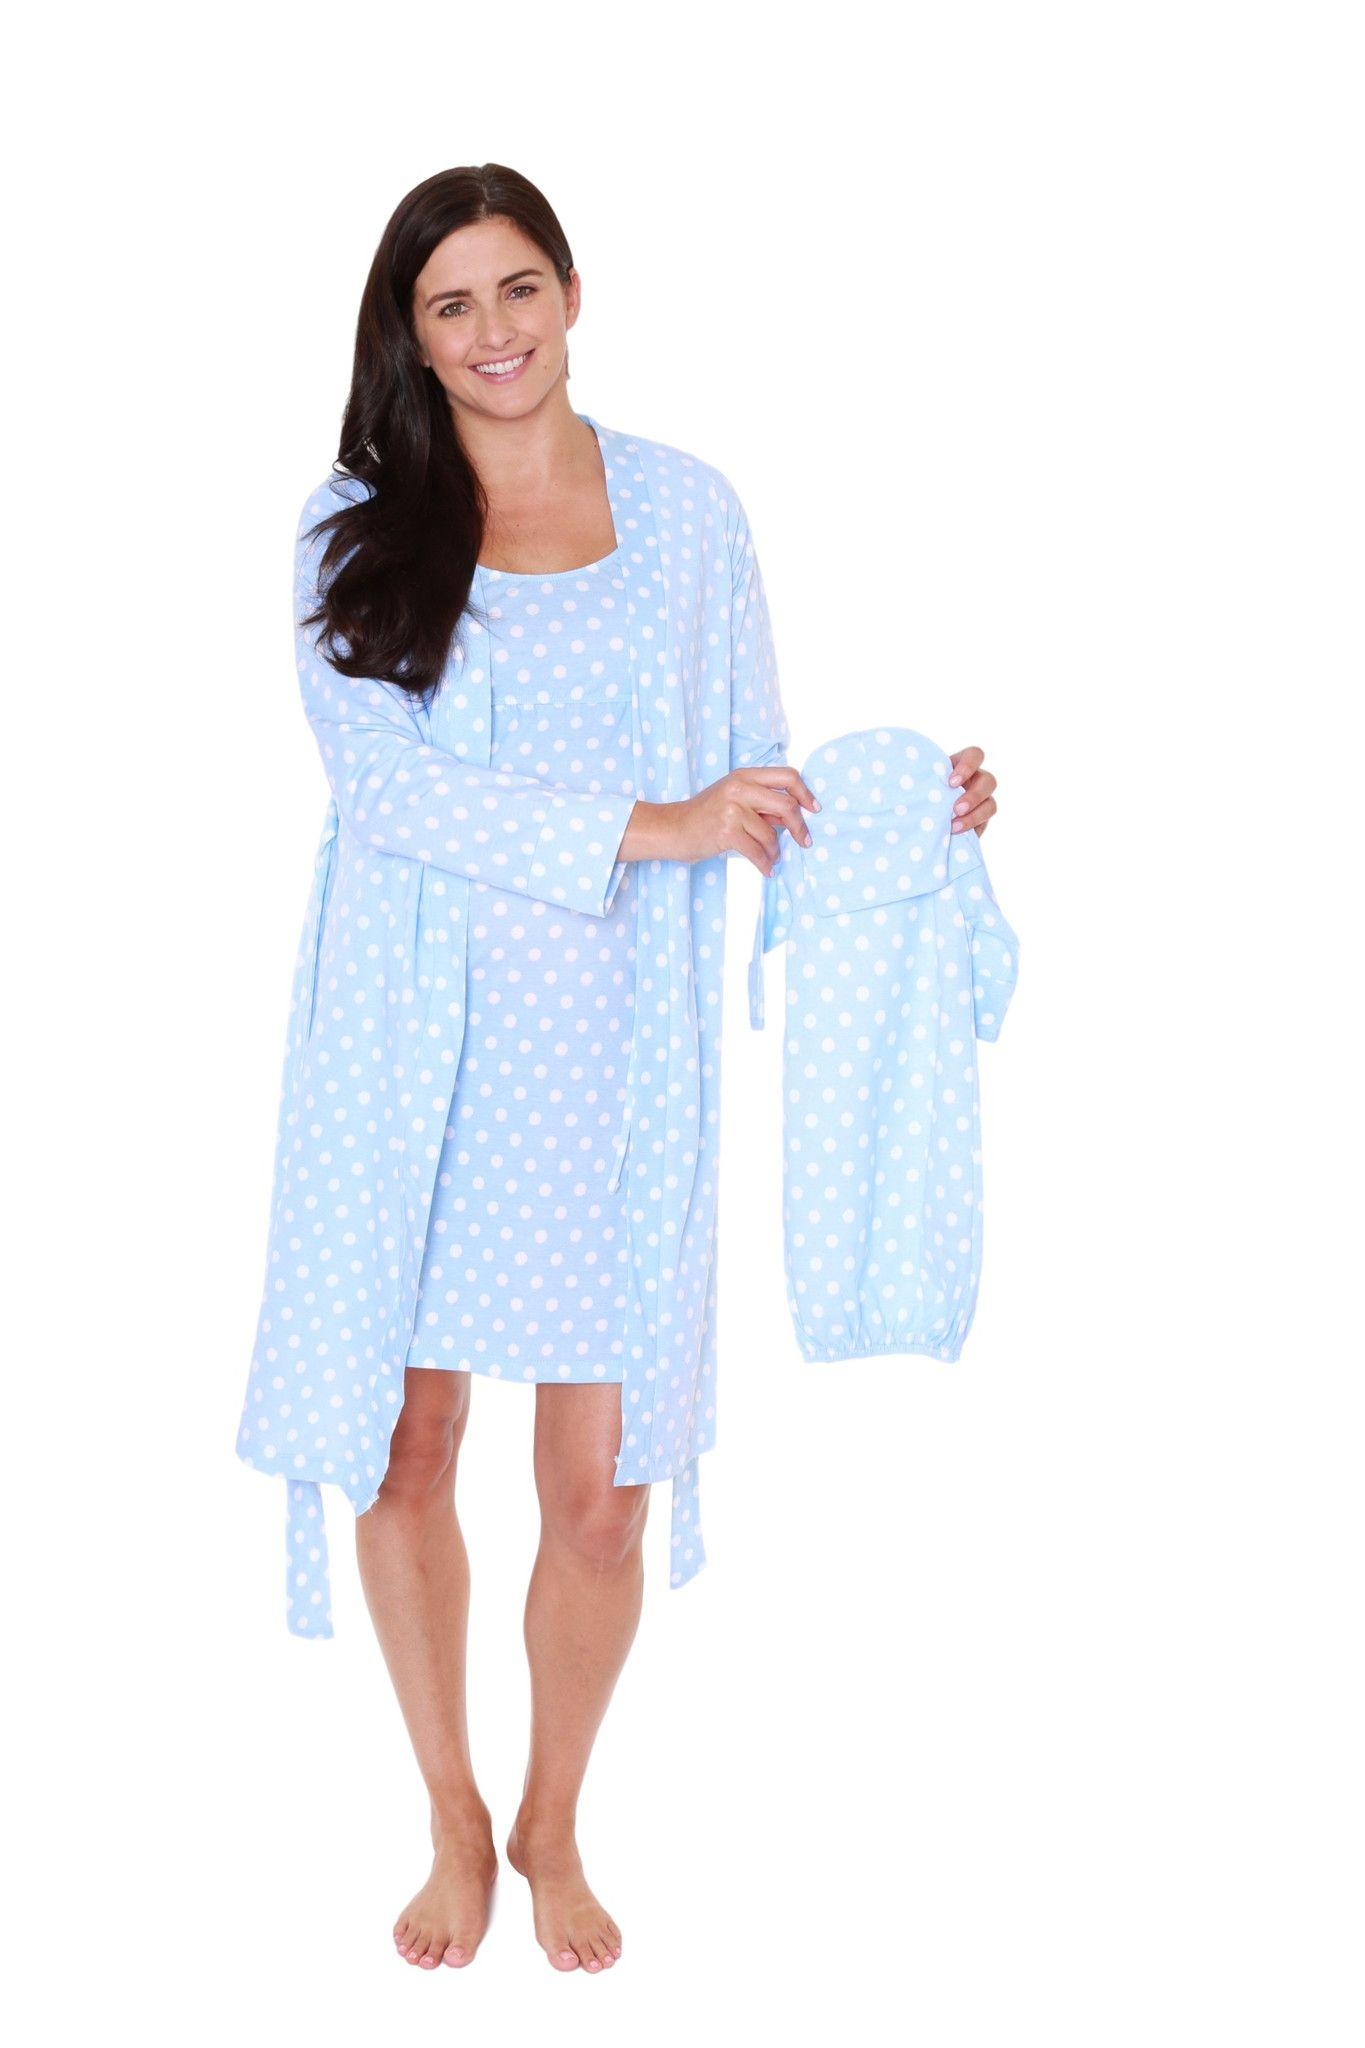 Nicole Robe Nightgown Baby Set Nursing Nightgown Night Gown Nursing Robe